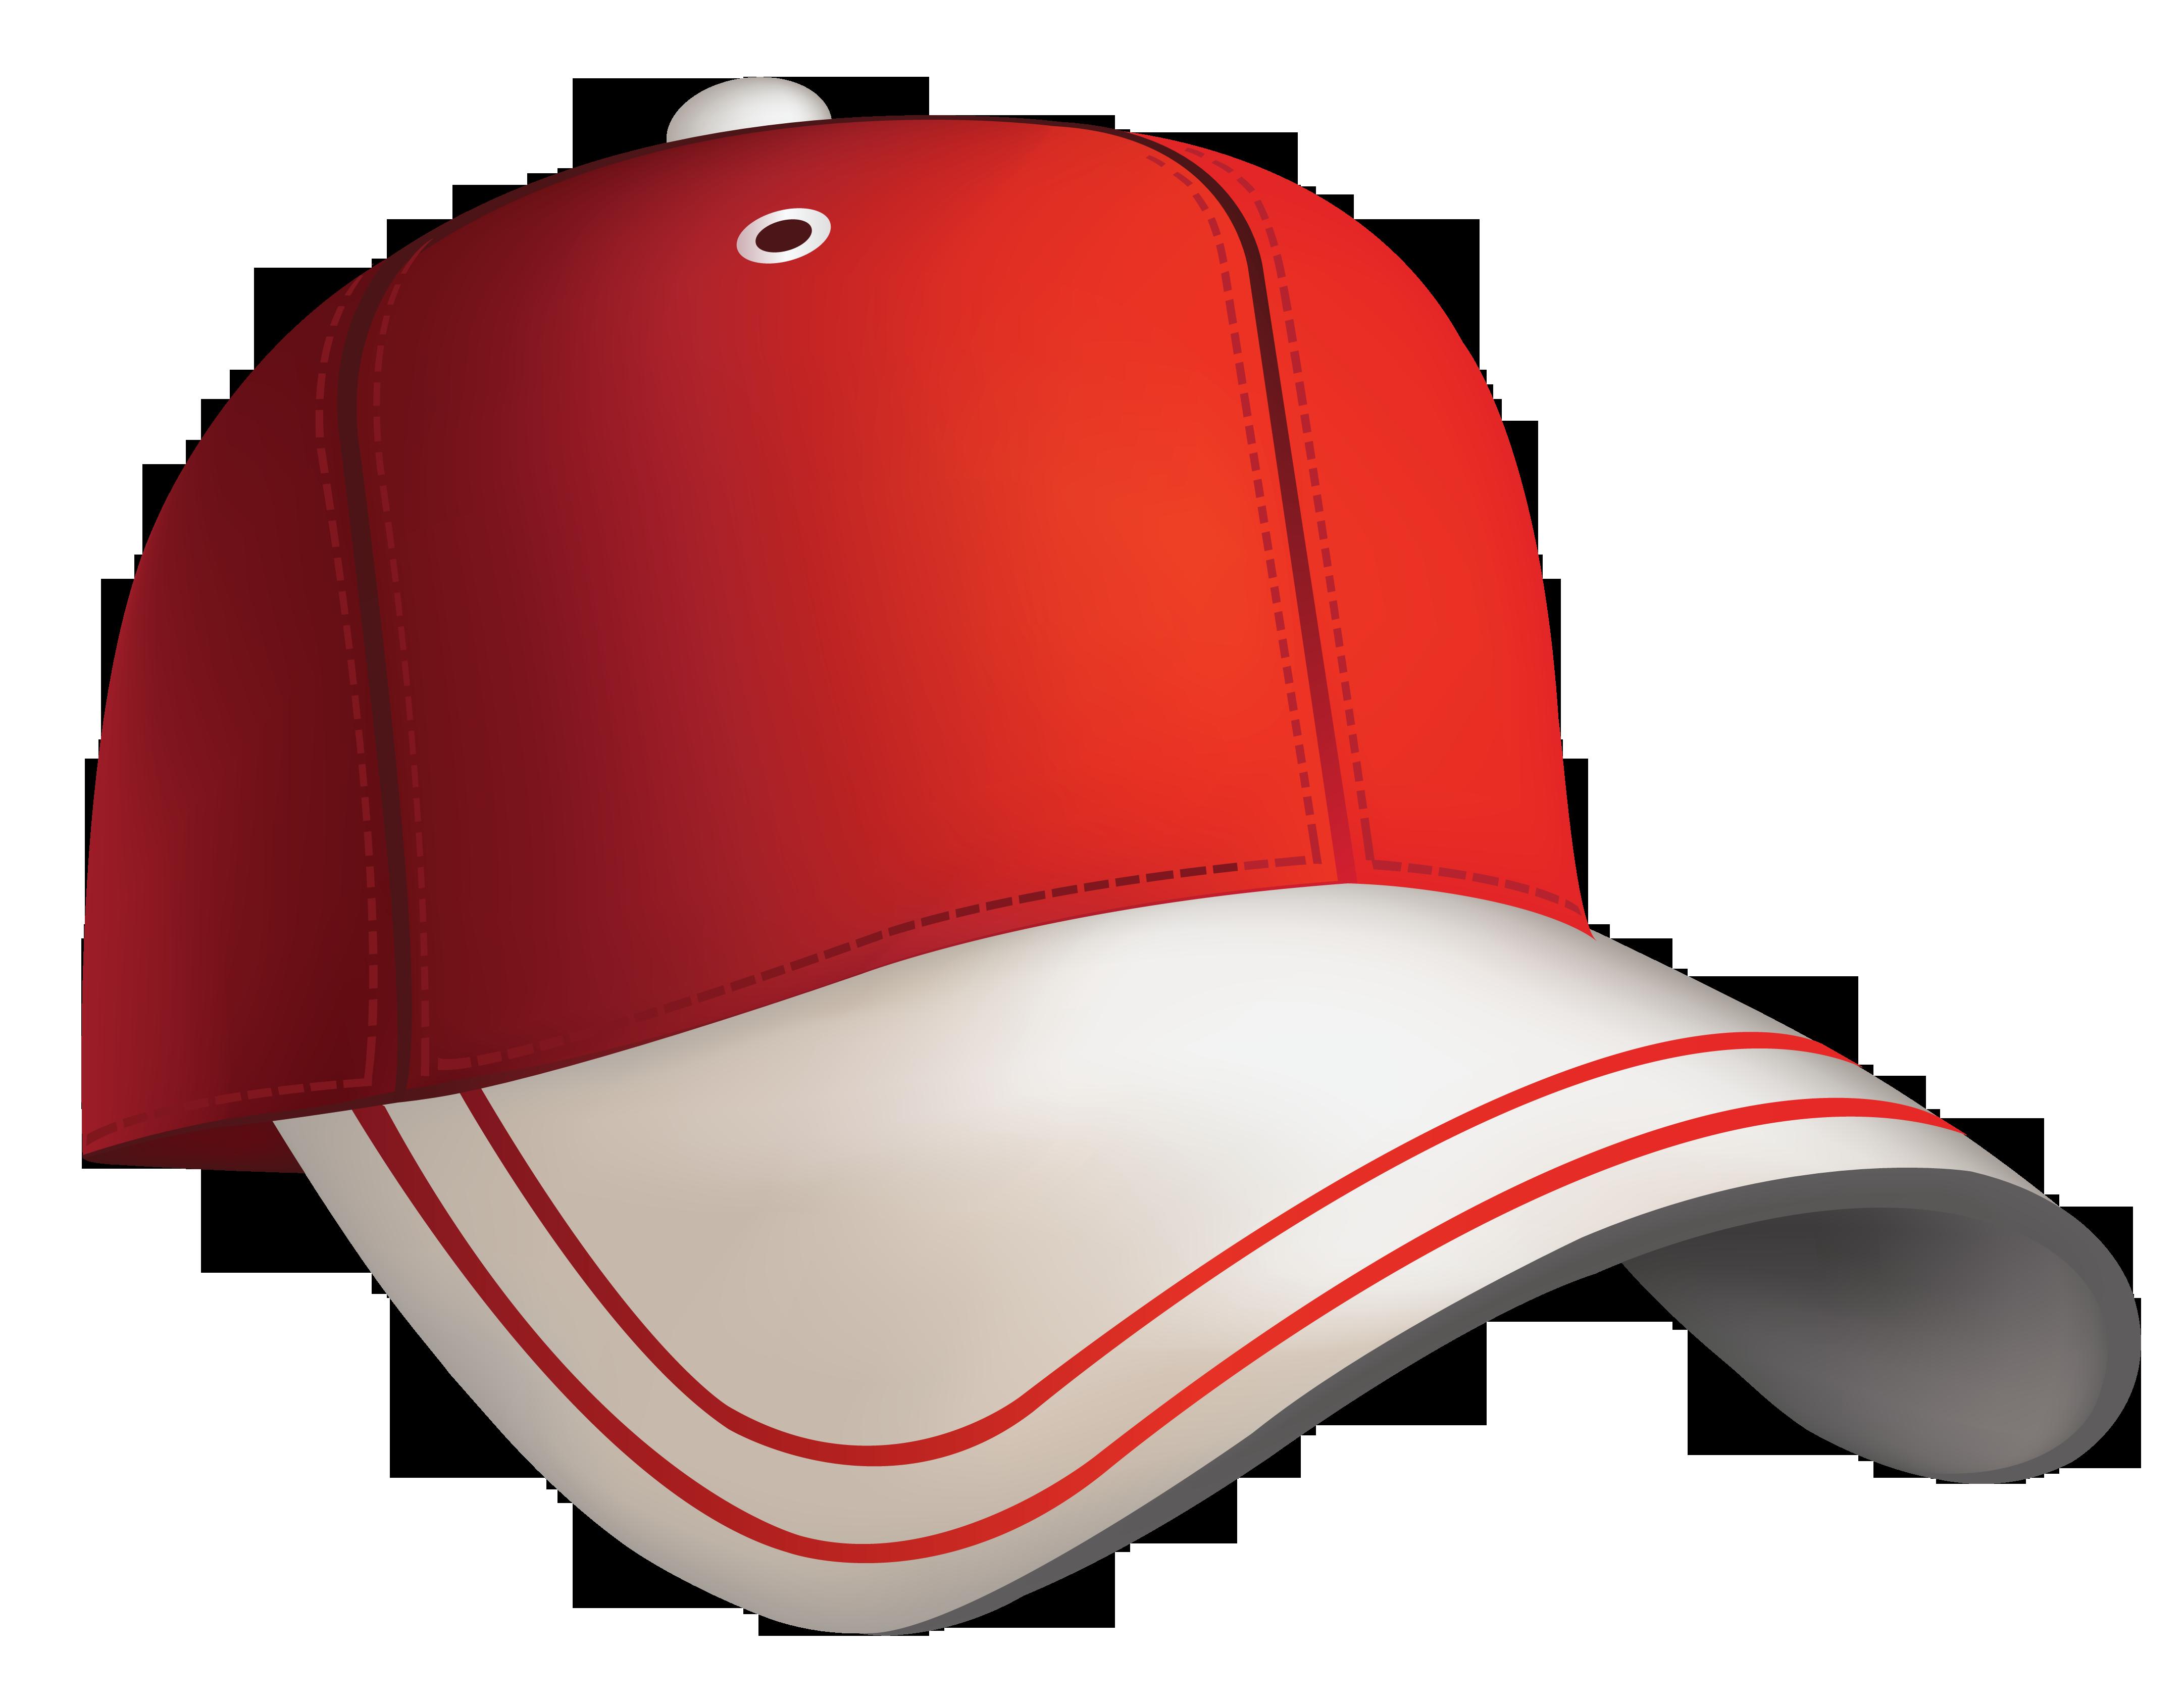 PNG File Name: Cap PlusPng.com  - Cap PNG